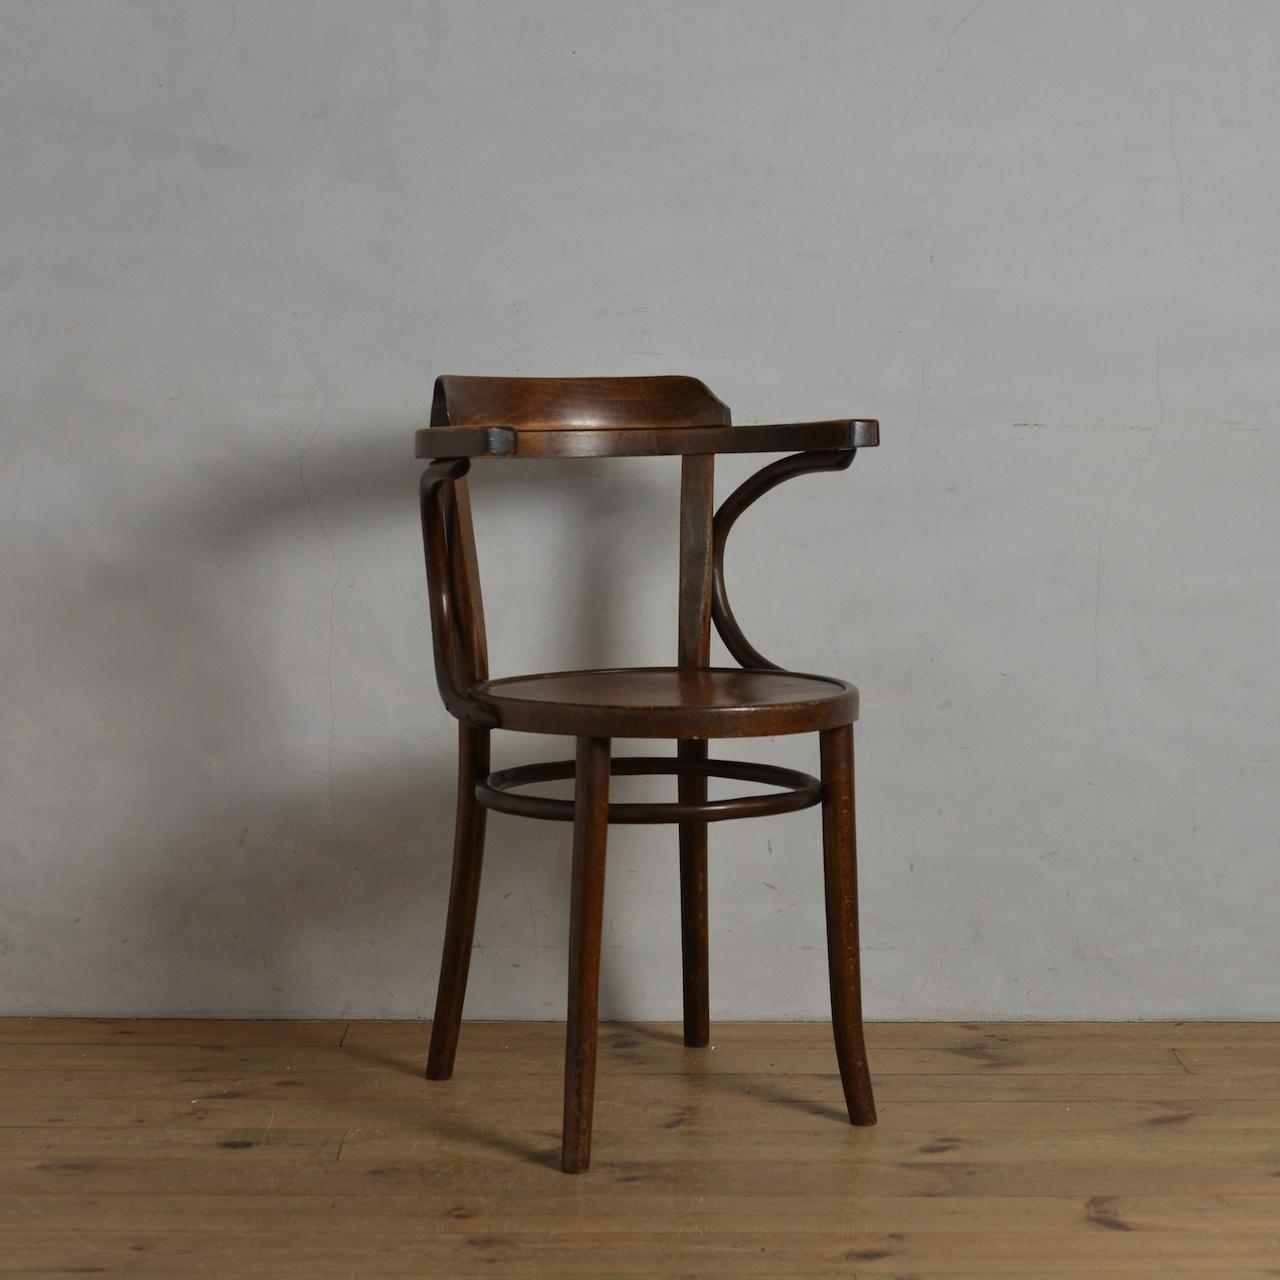 Bentwood Arm Chair【B】 / ベントウッド アーム チェア 〈ダイニングチェア・デスクチェア〉SW2002-0006B